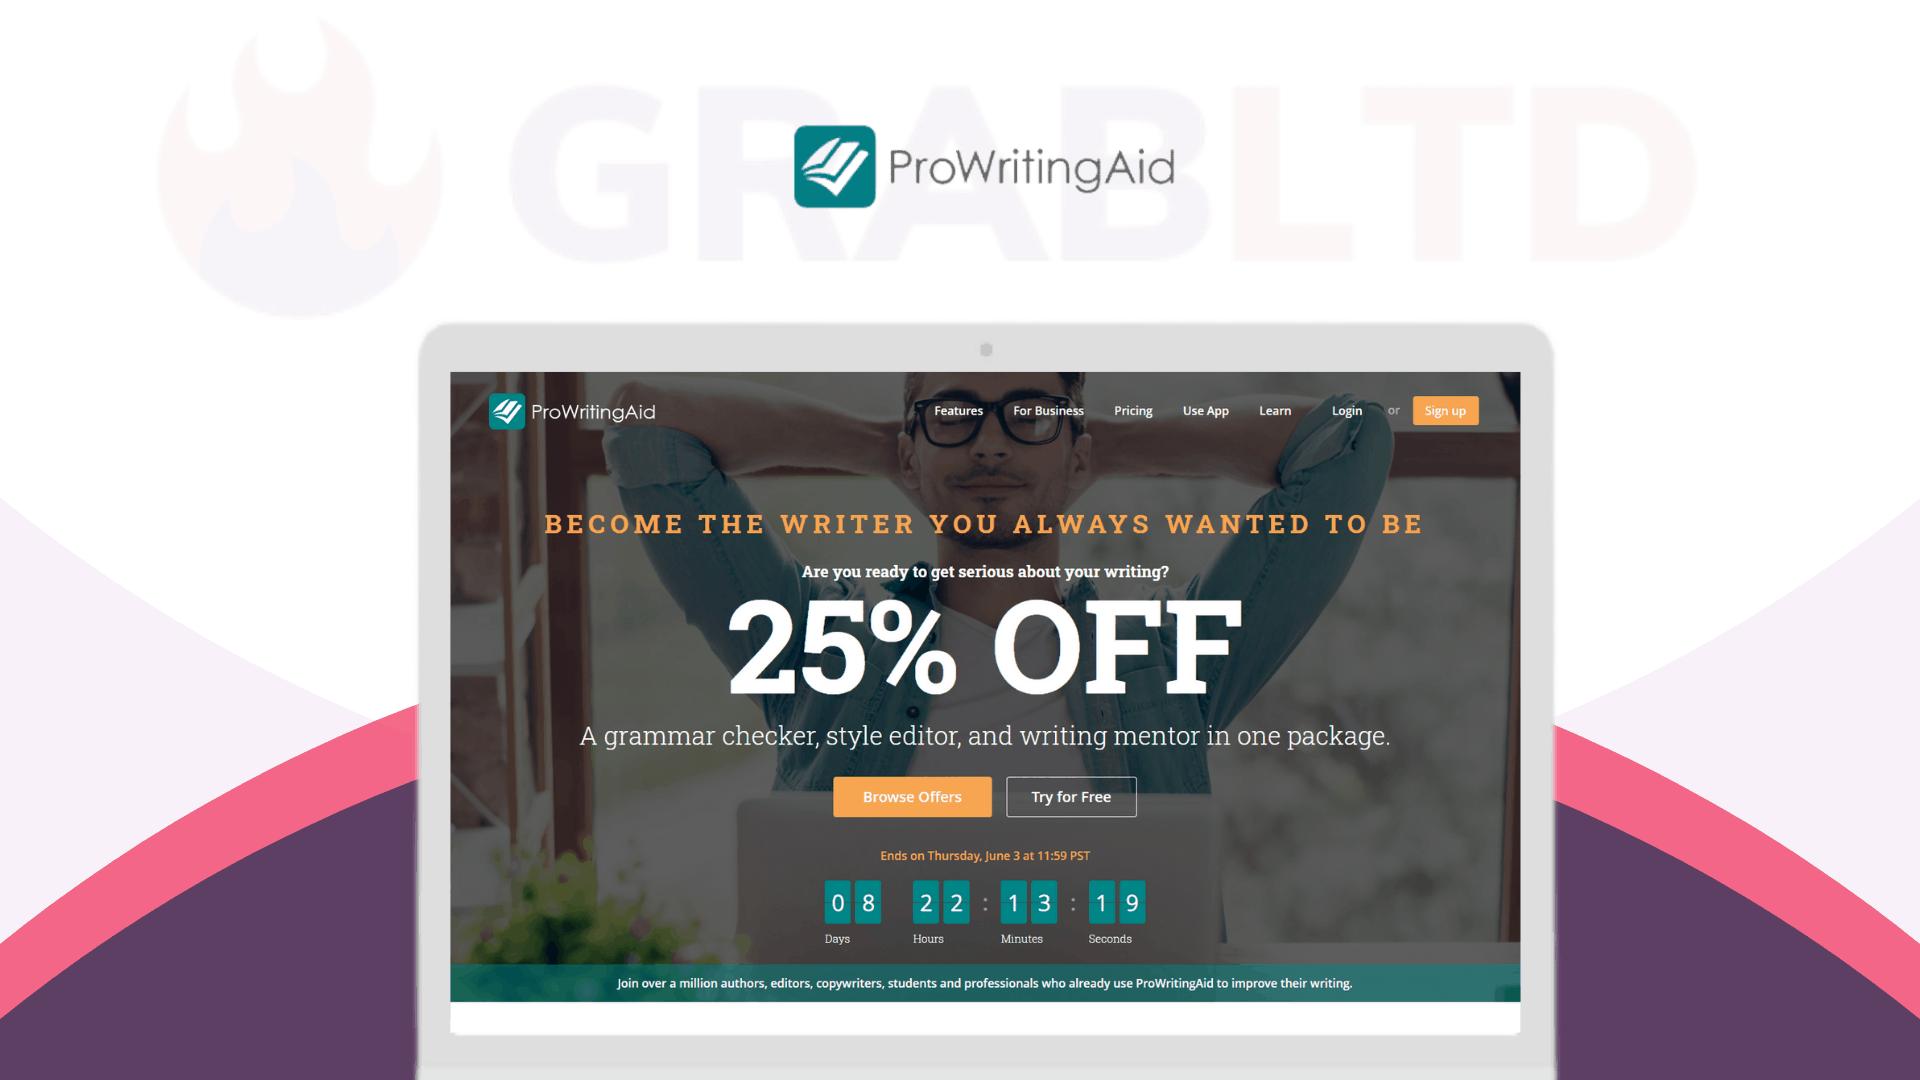 ProWritingAid Lifetime Deal